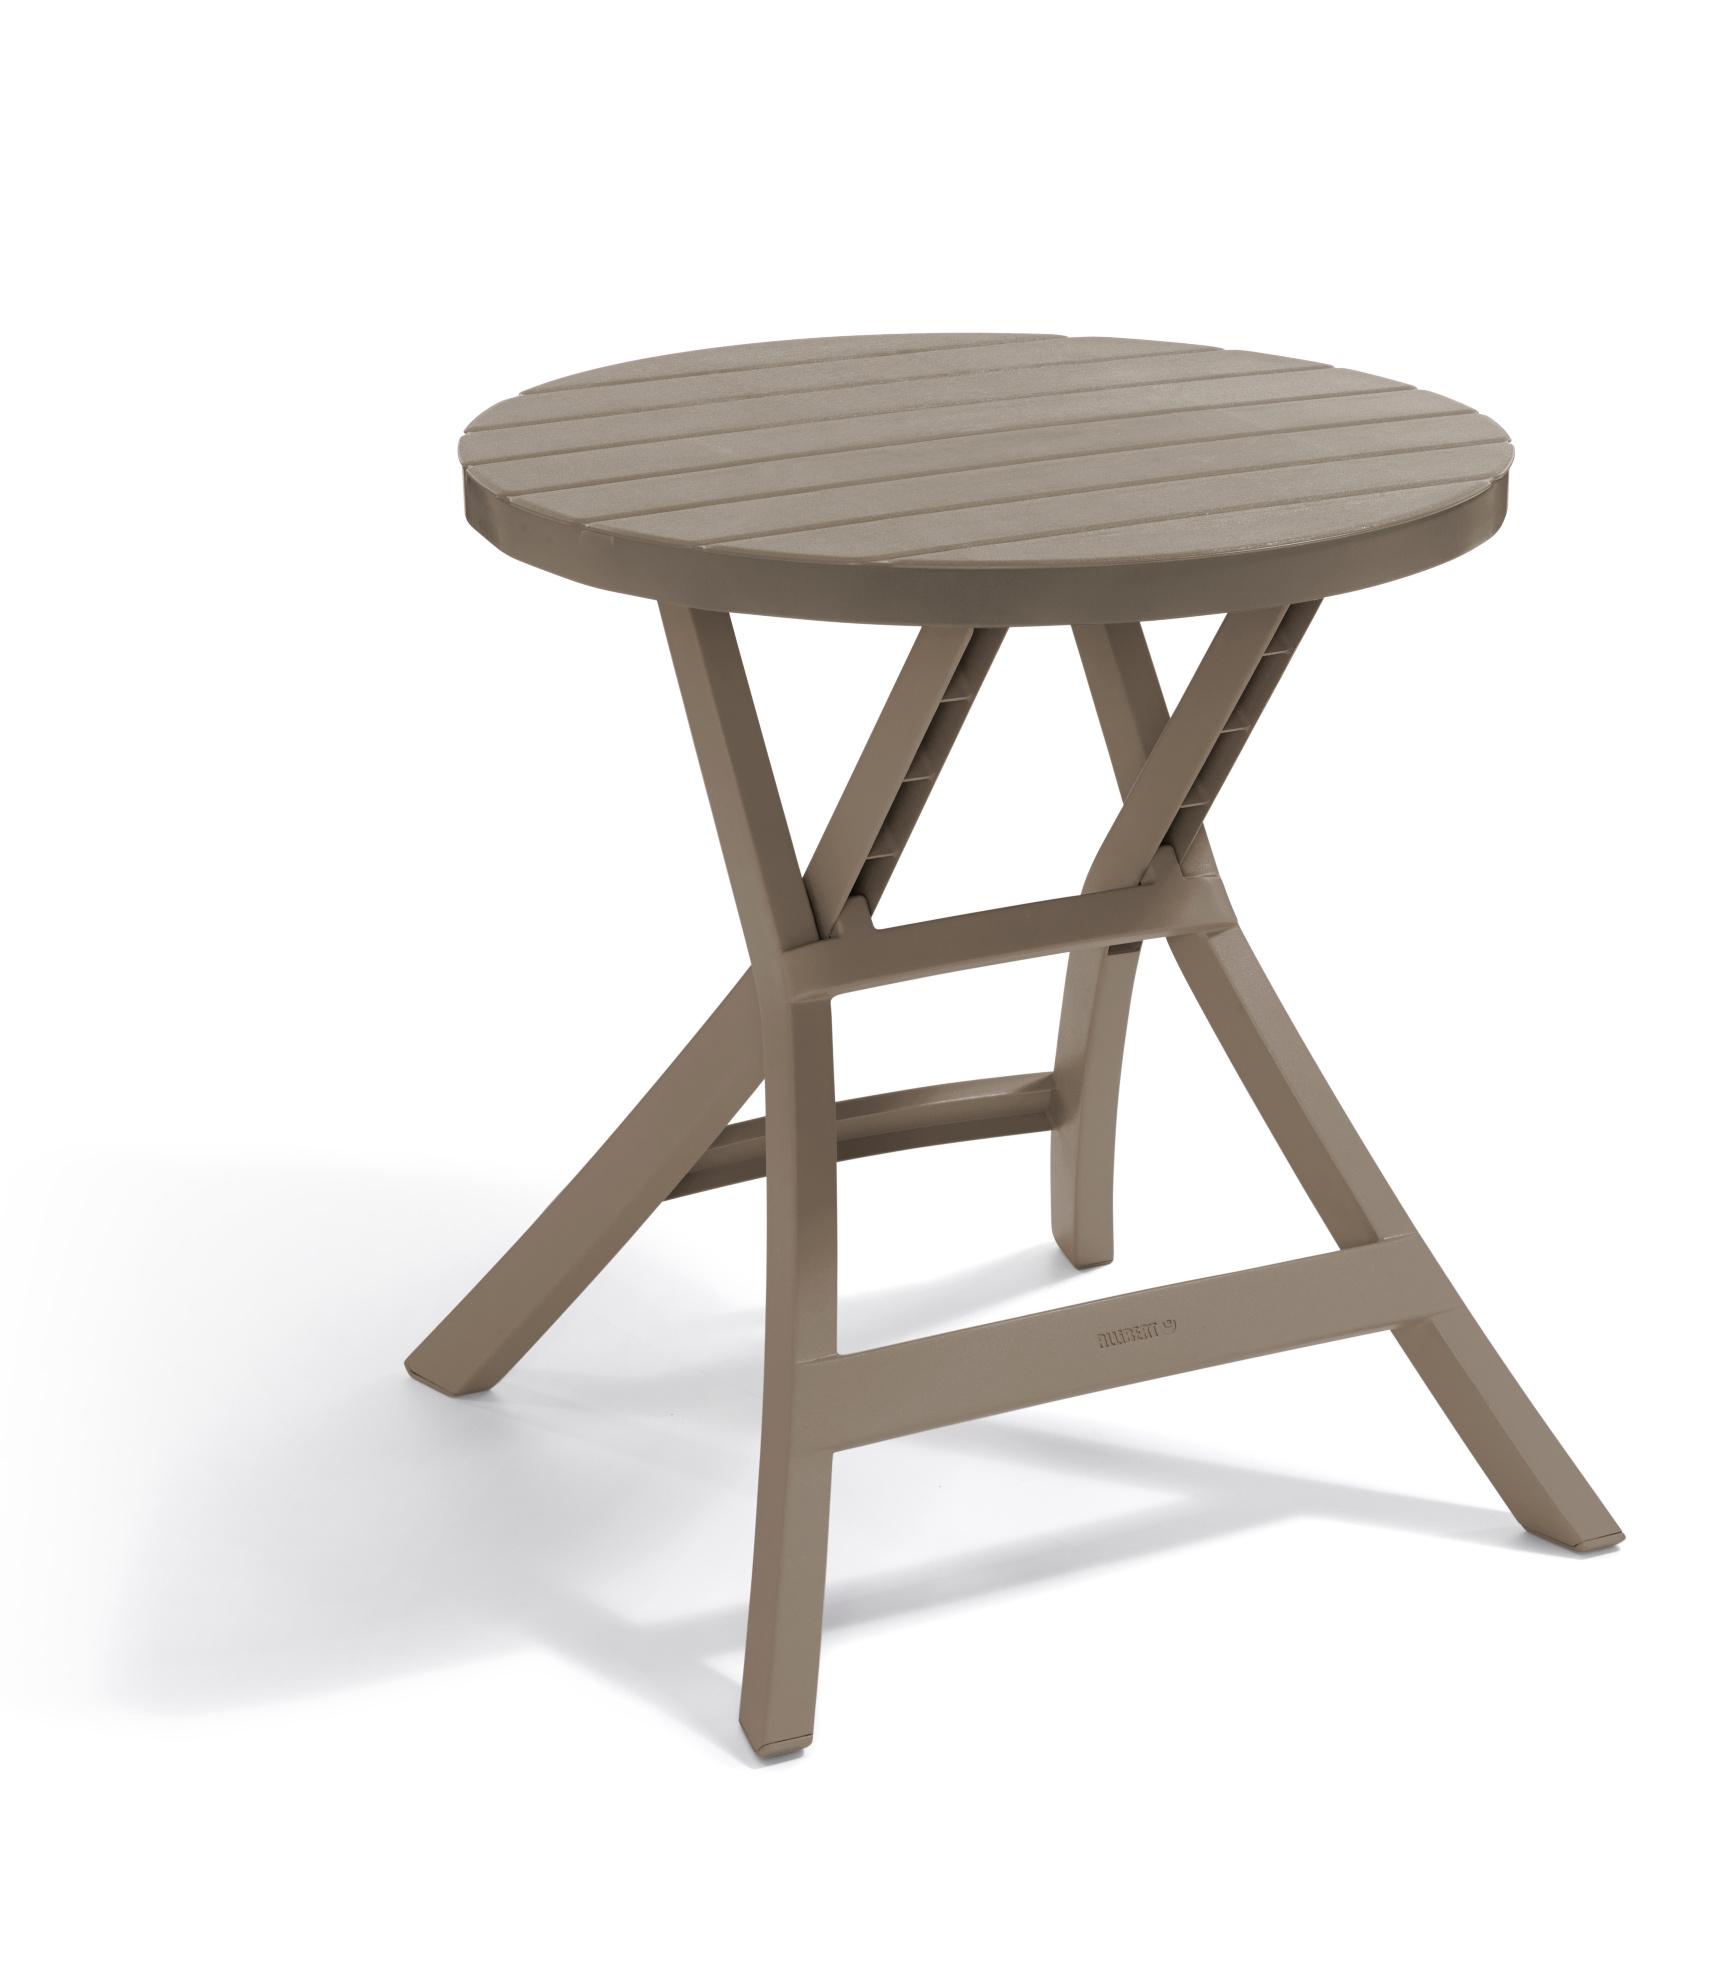 allibert oregon table pliante cappuccino allibert. Black Bedroom Furniture Sets. Home Design Ideas